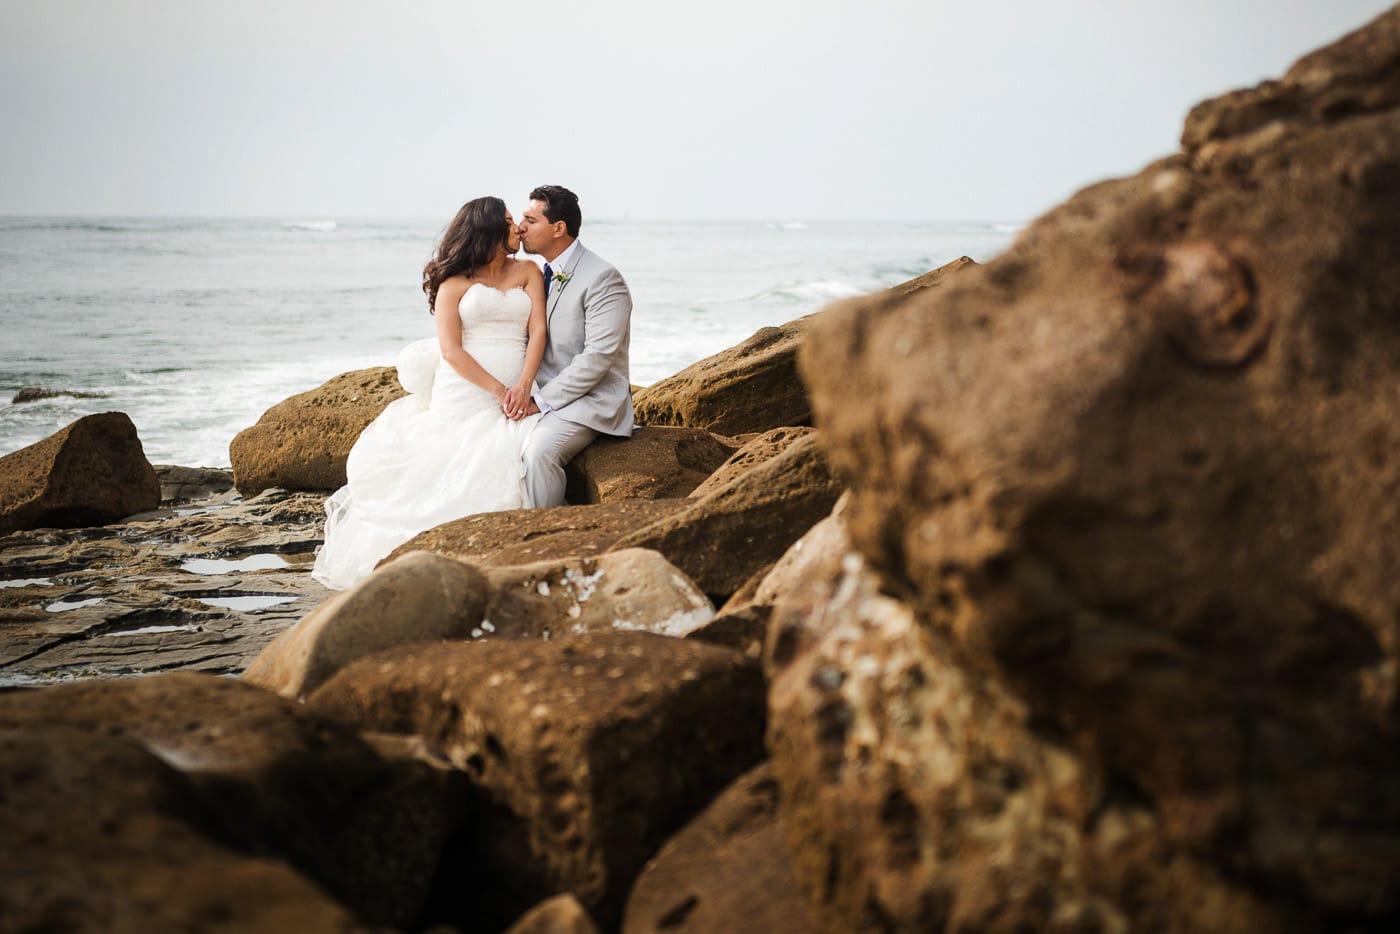 Sunset Cliffs Portrait Session: Candid photo of Bride&Groom